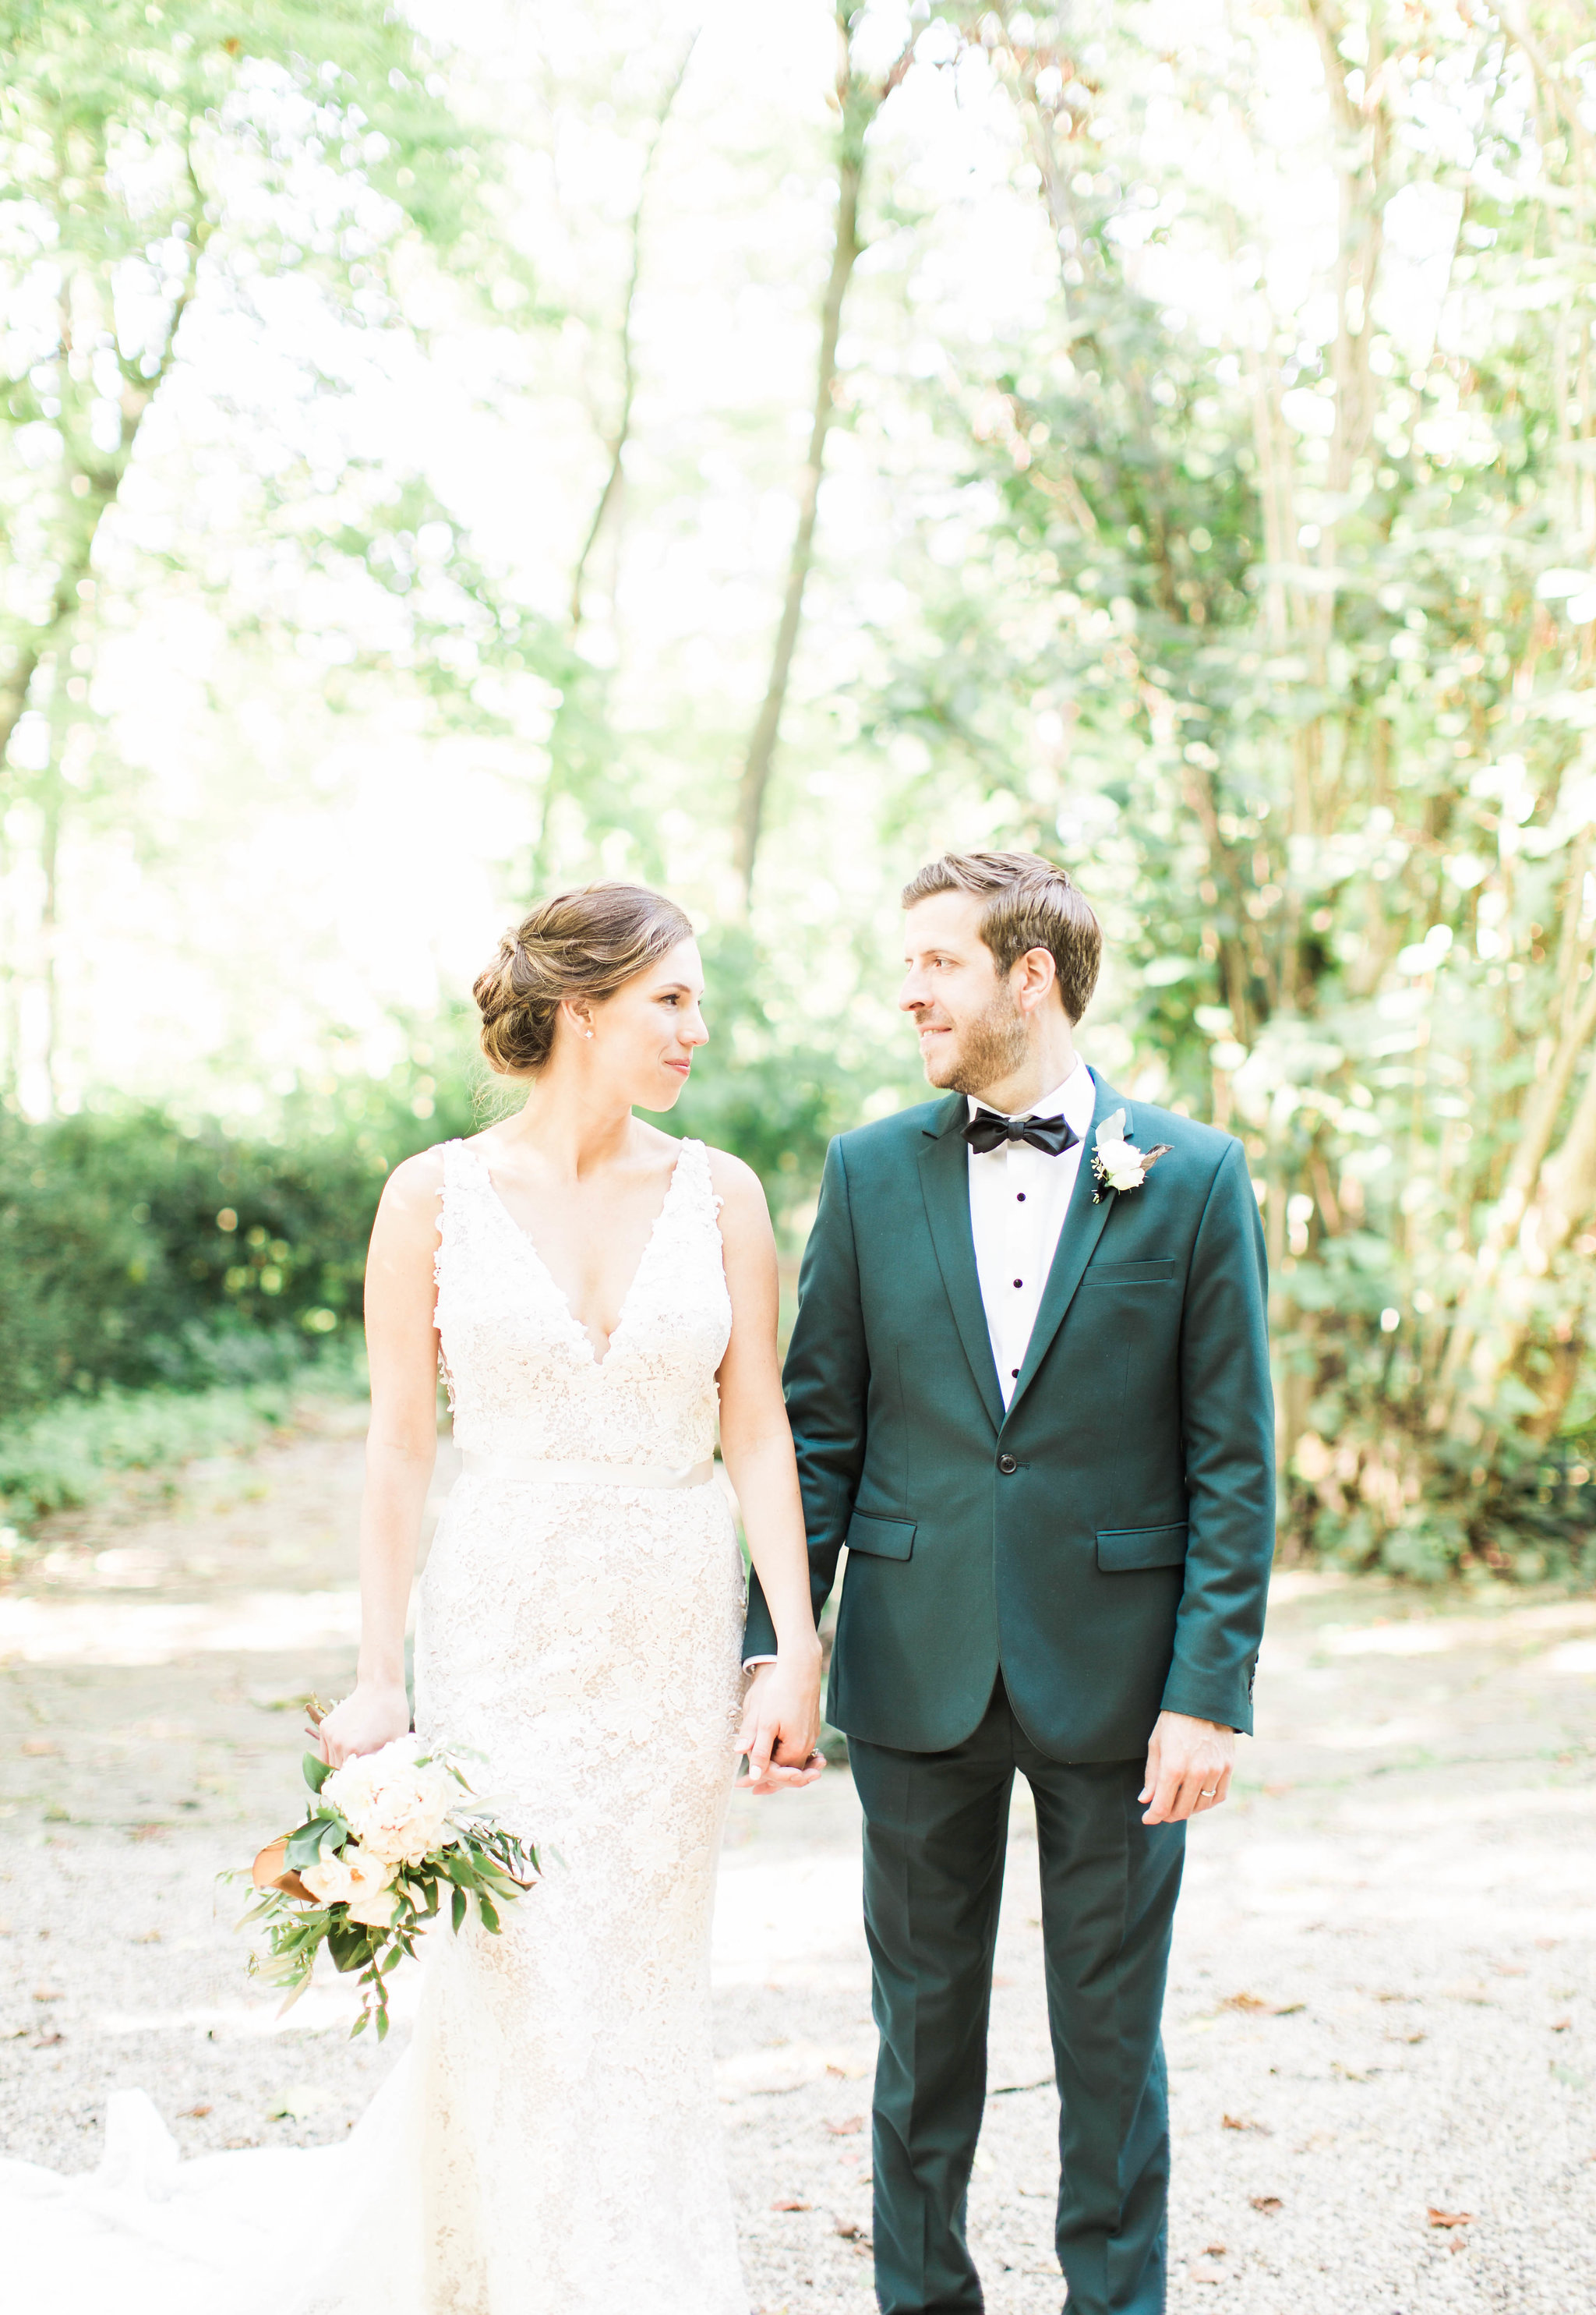 Fernwood Botanical Garden and Nature Preserve wedding portrait